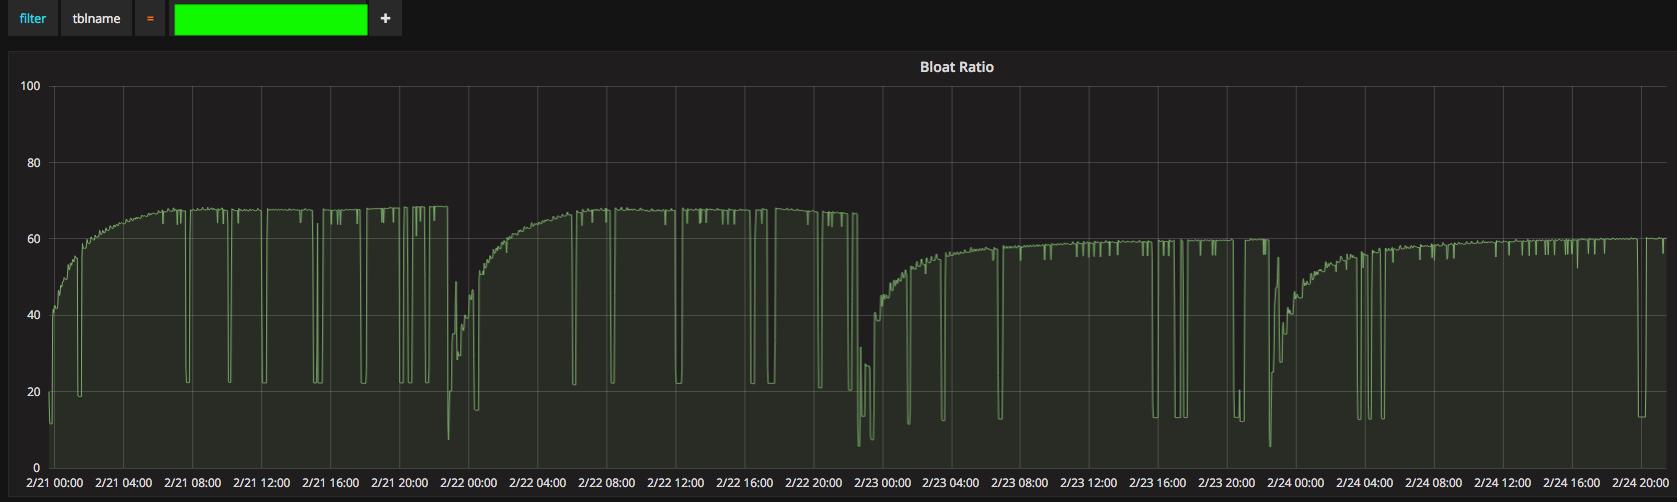 Monitoring PostgreSQL with Telegraf, InfluxDB, and Grafana - Kloudless